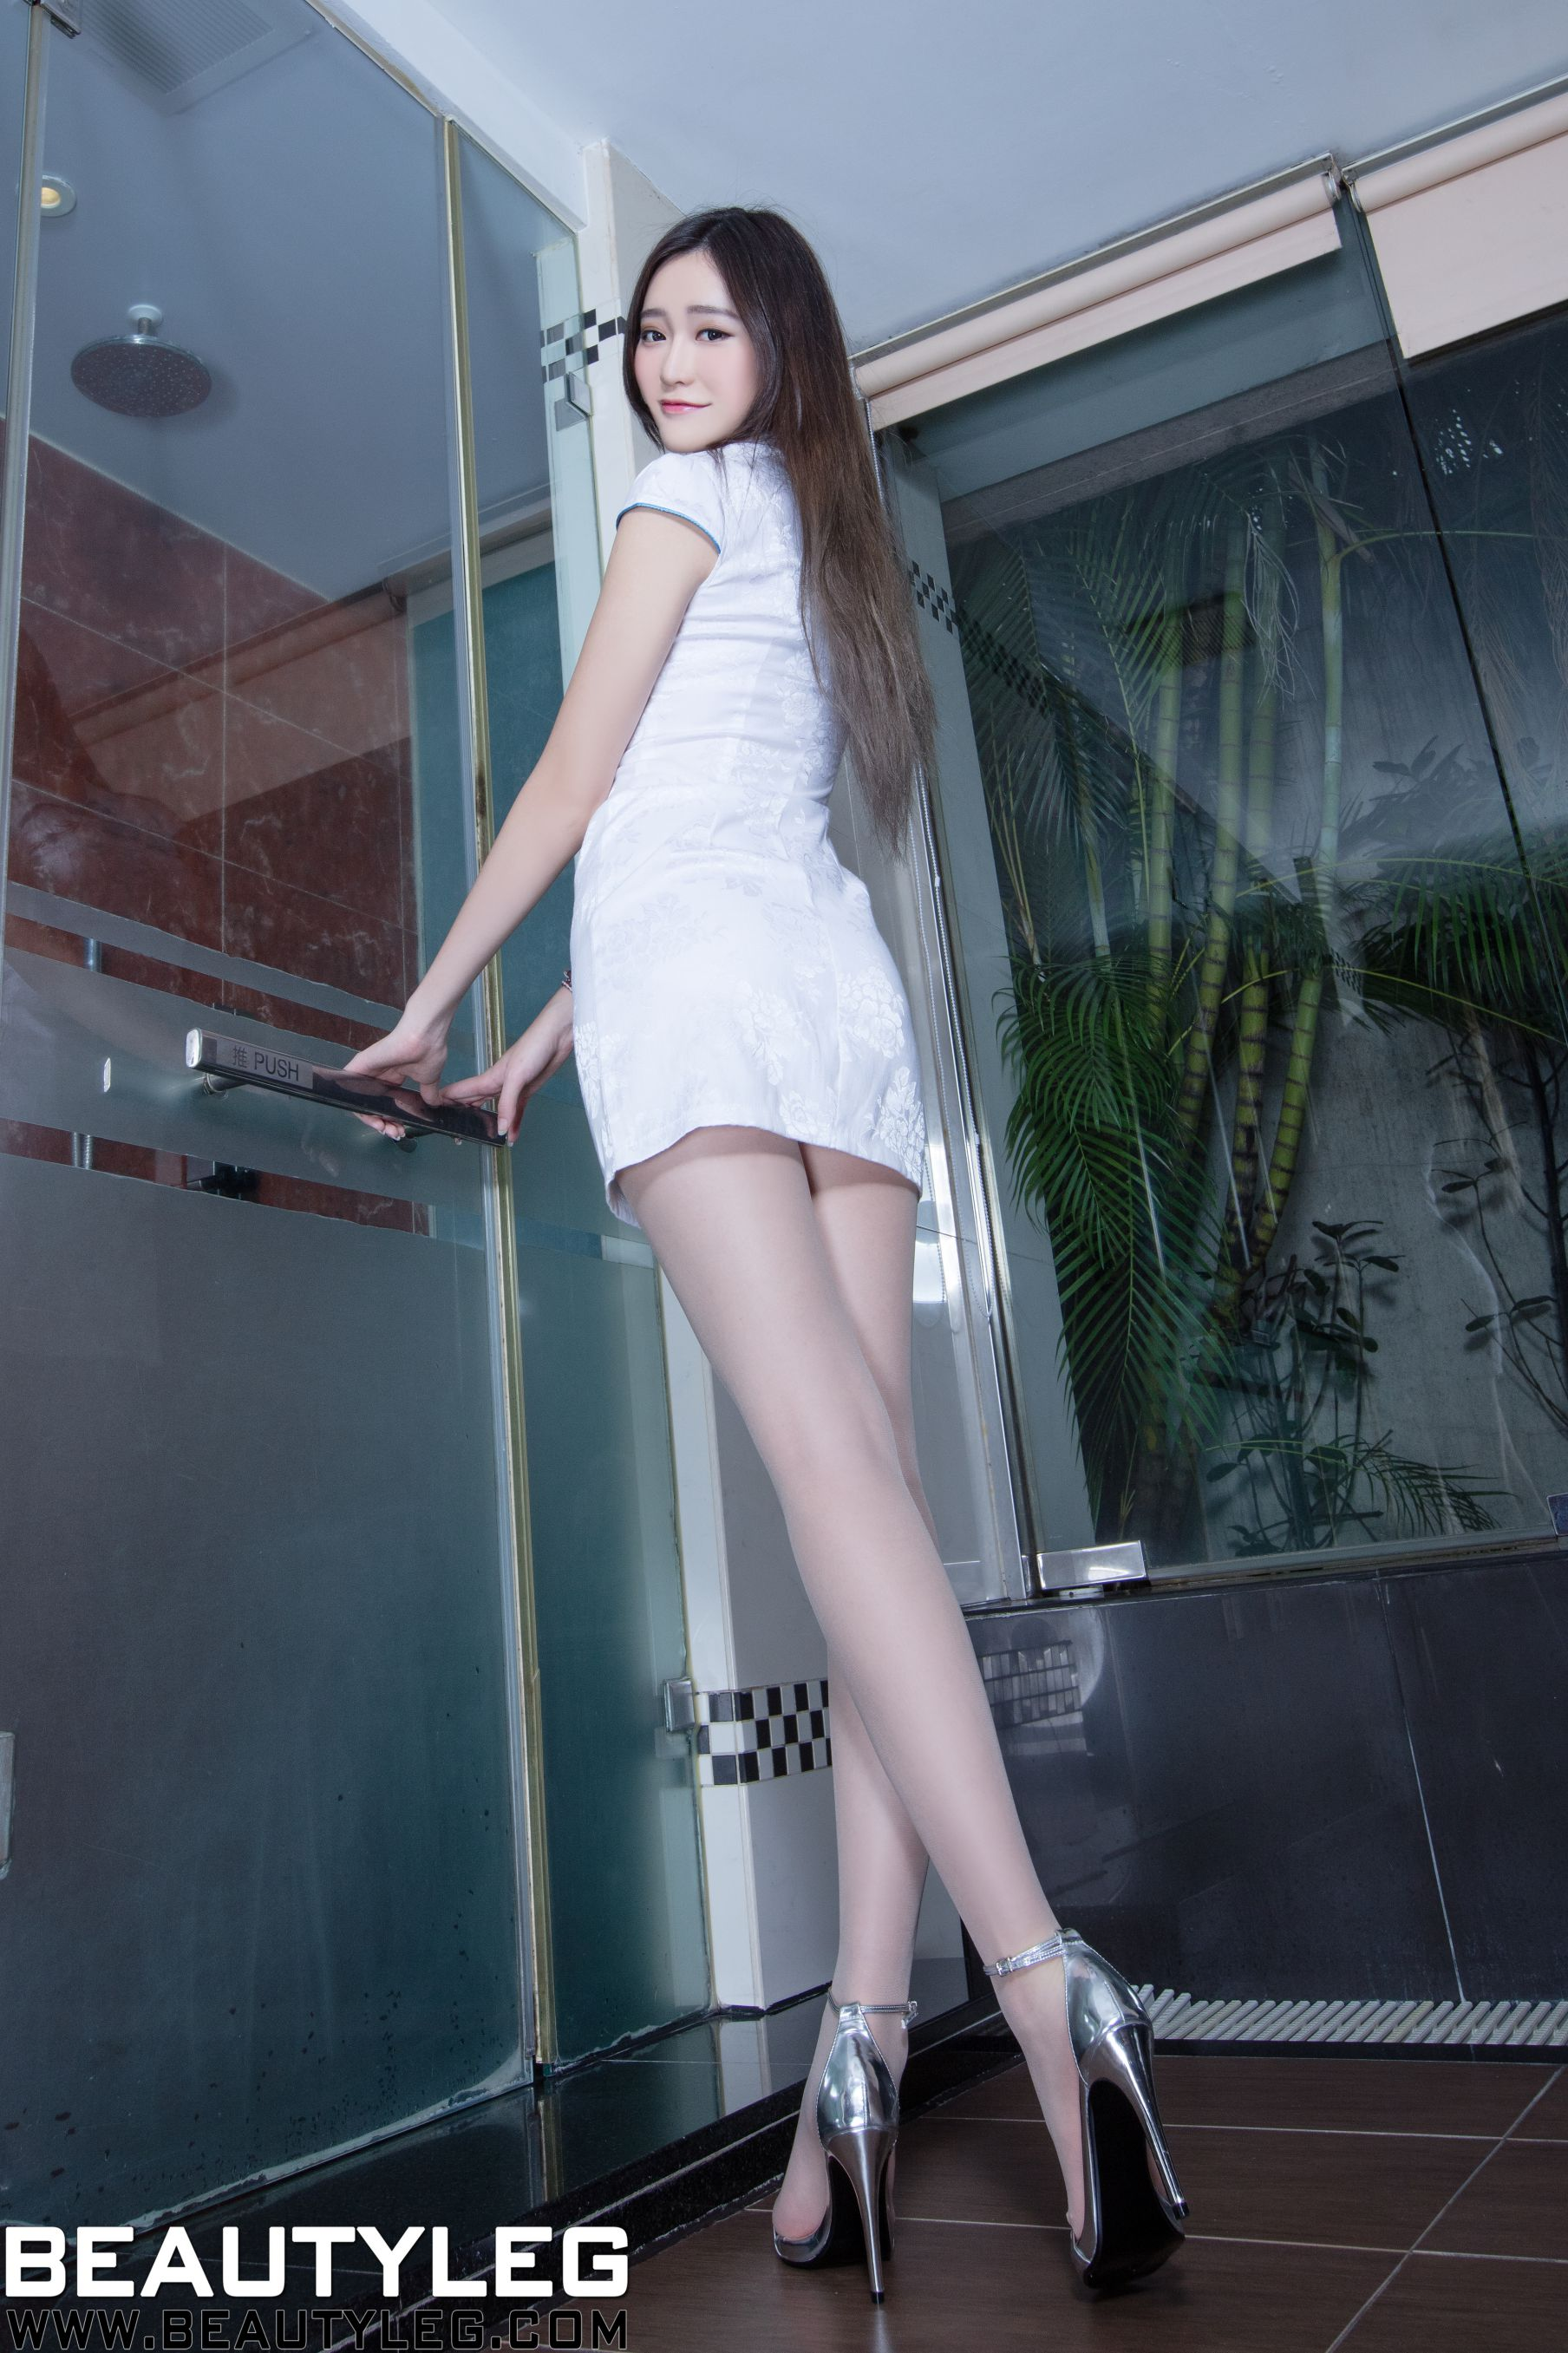 VOL.1240 [Beautyleg]长腿美女:张采宁(腿模Ning)高品质写真套图(56P)